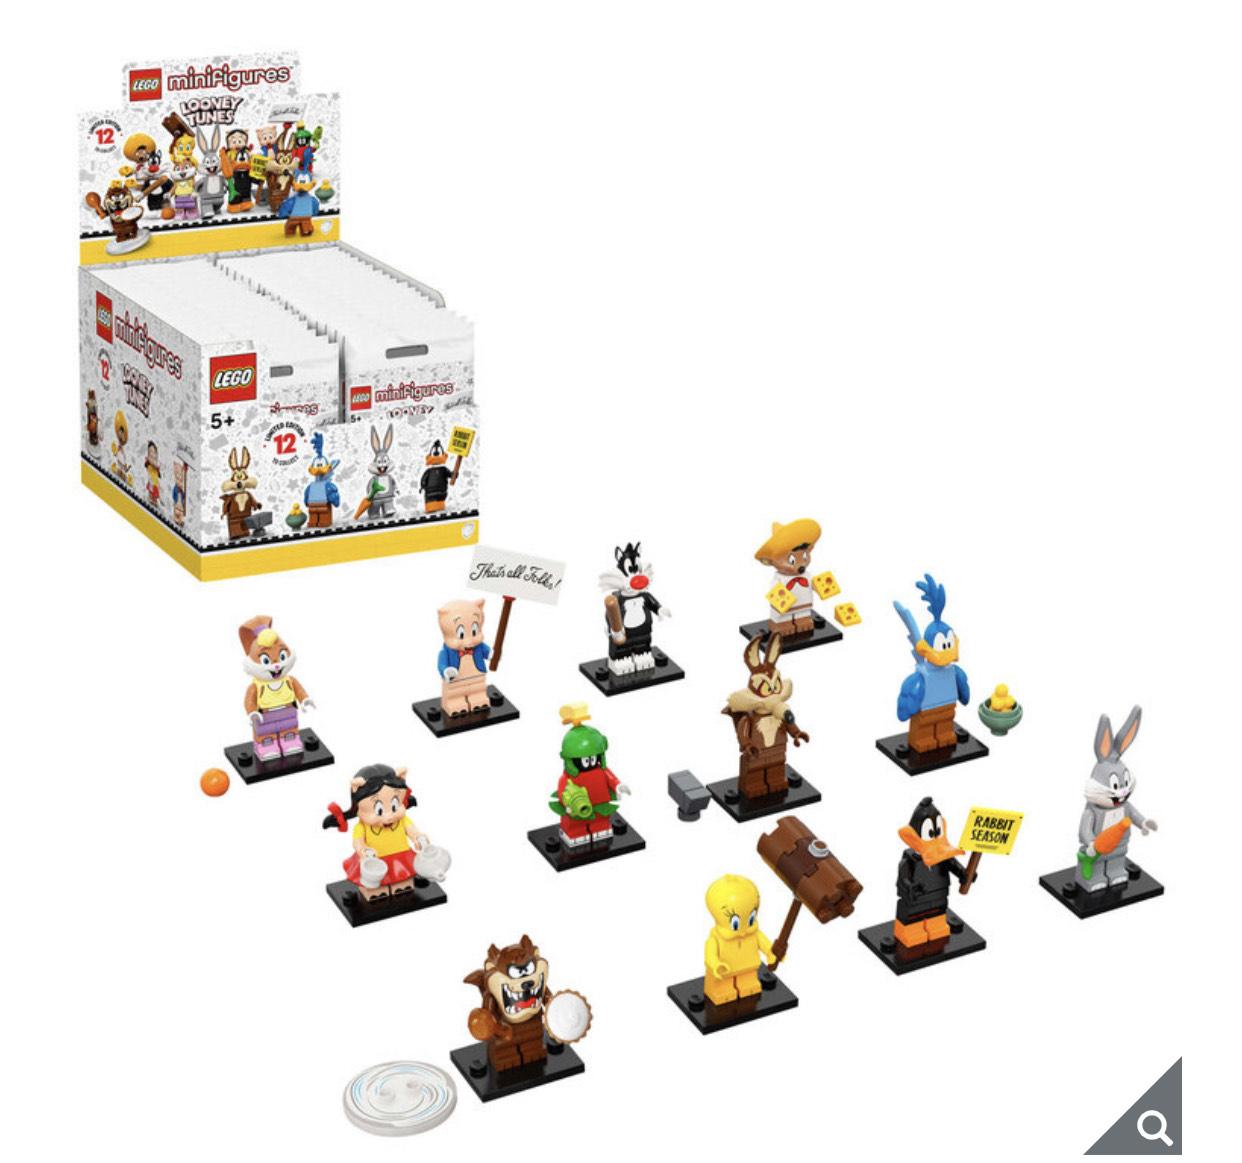 LEGO Looney Tunes Minifigures box of 36 £99.99 (Membership Required) @ Costco